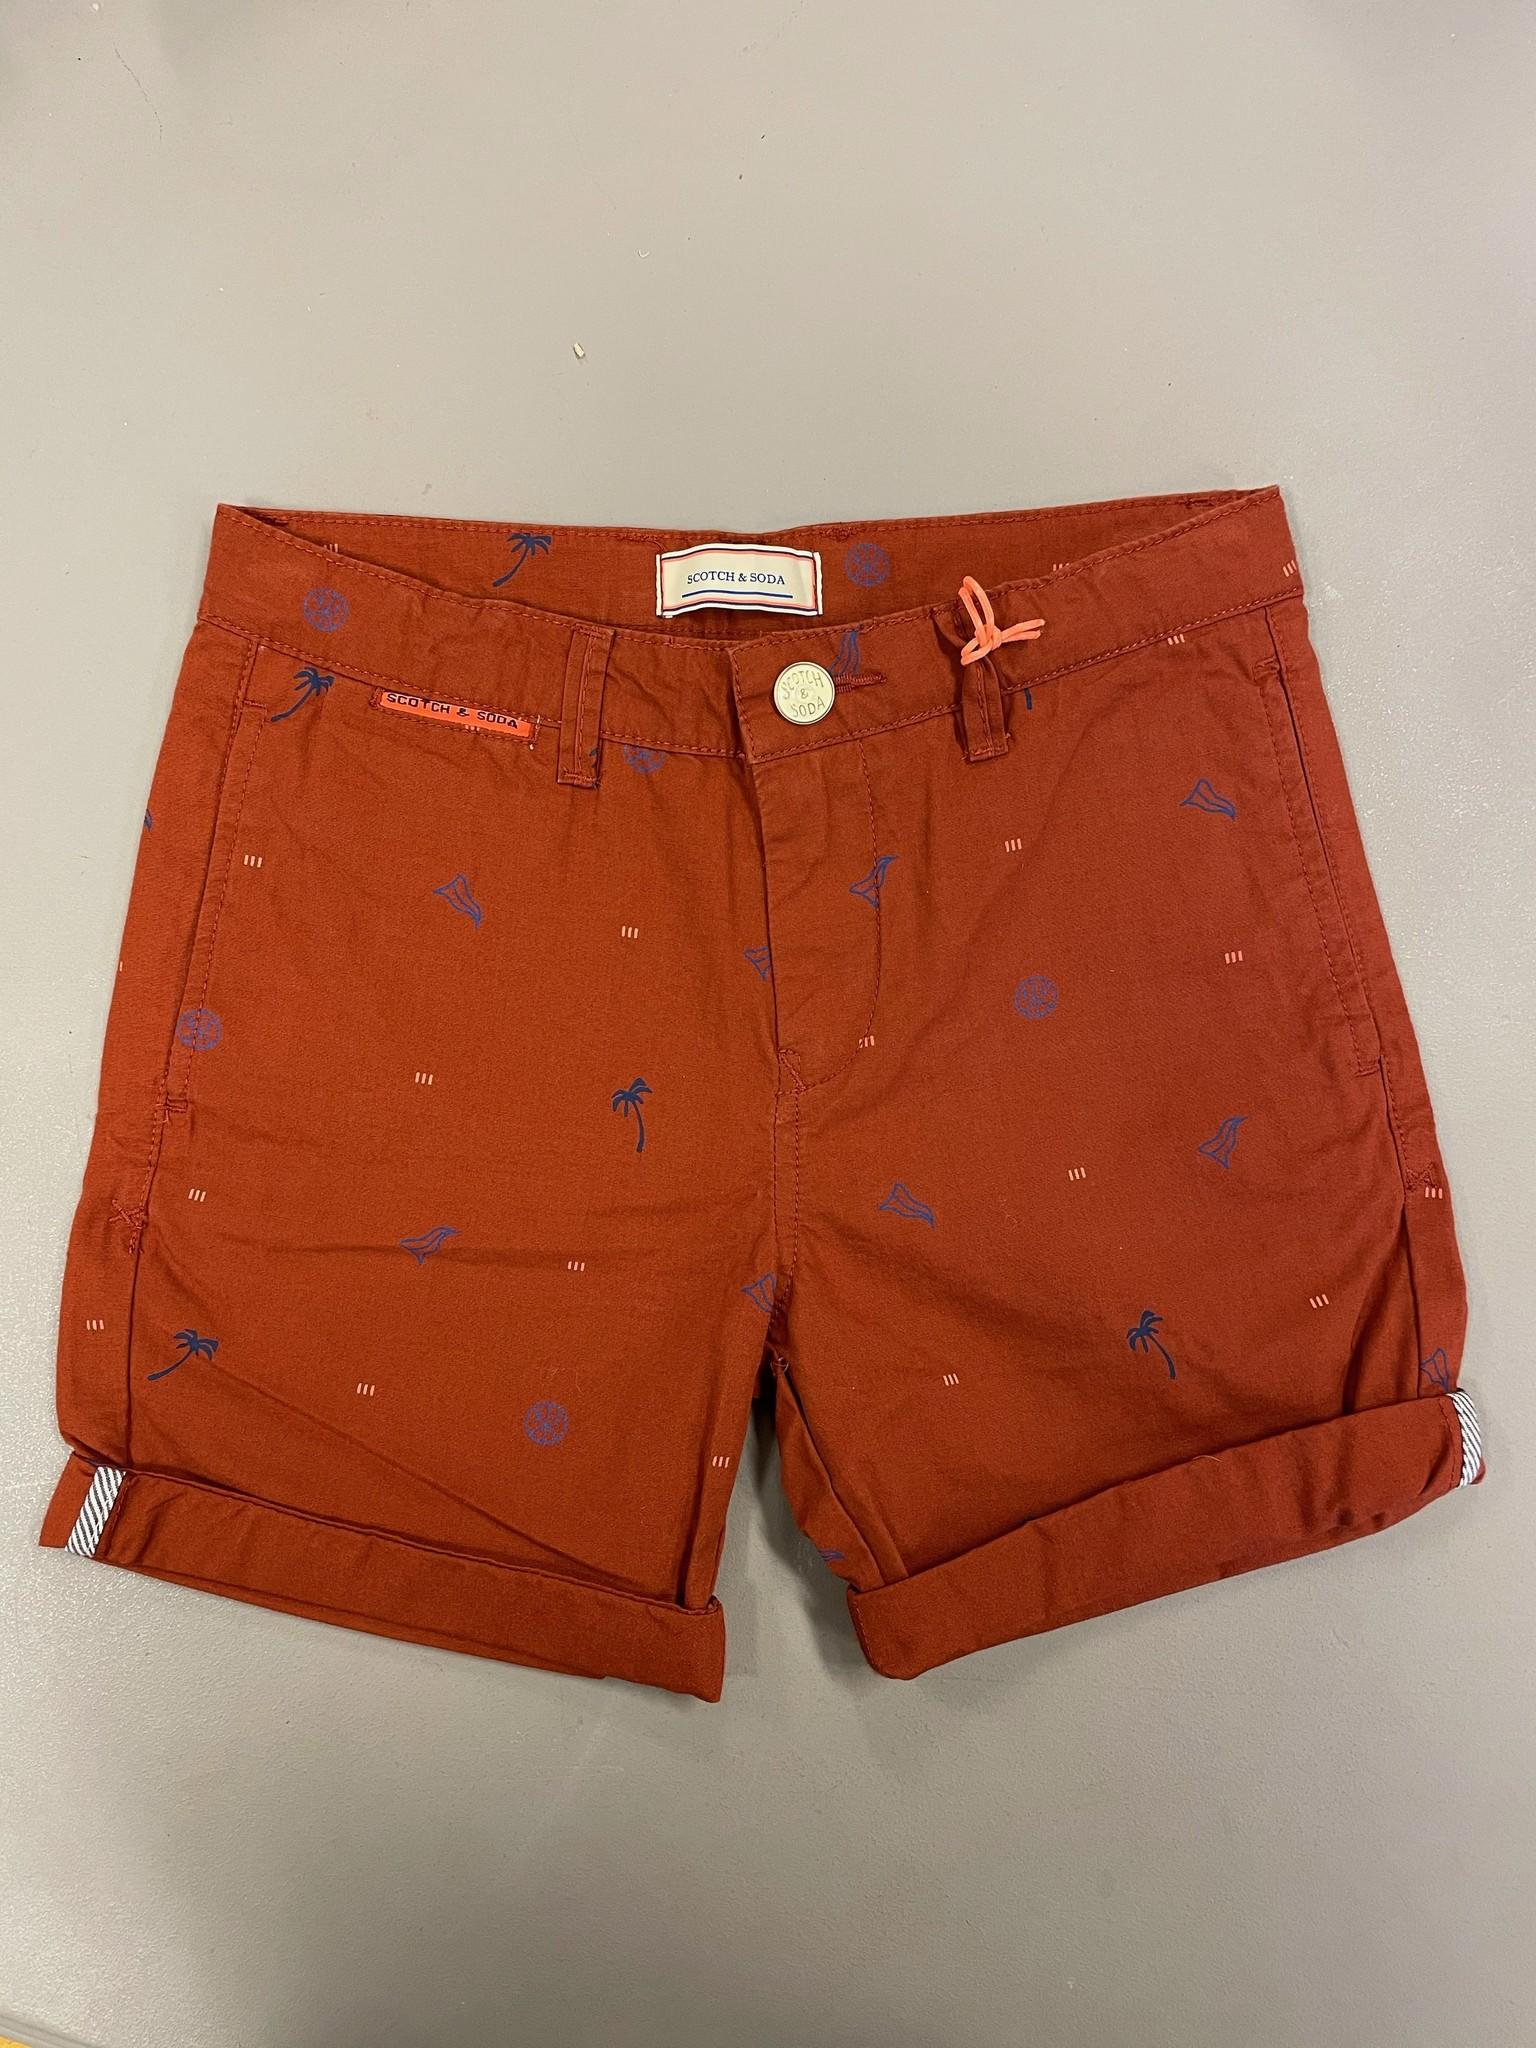 Scotch Shrunk Chino Shorts 154624 - Scotch